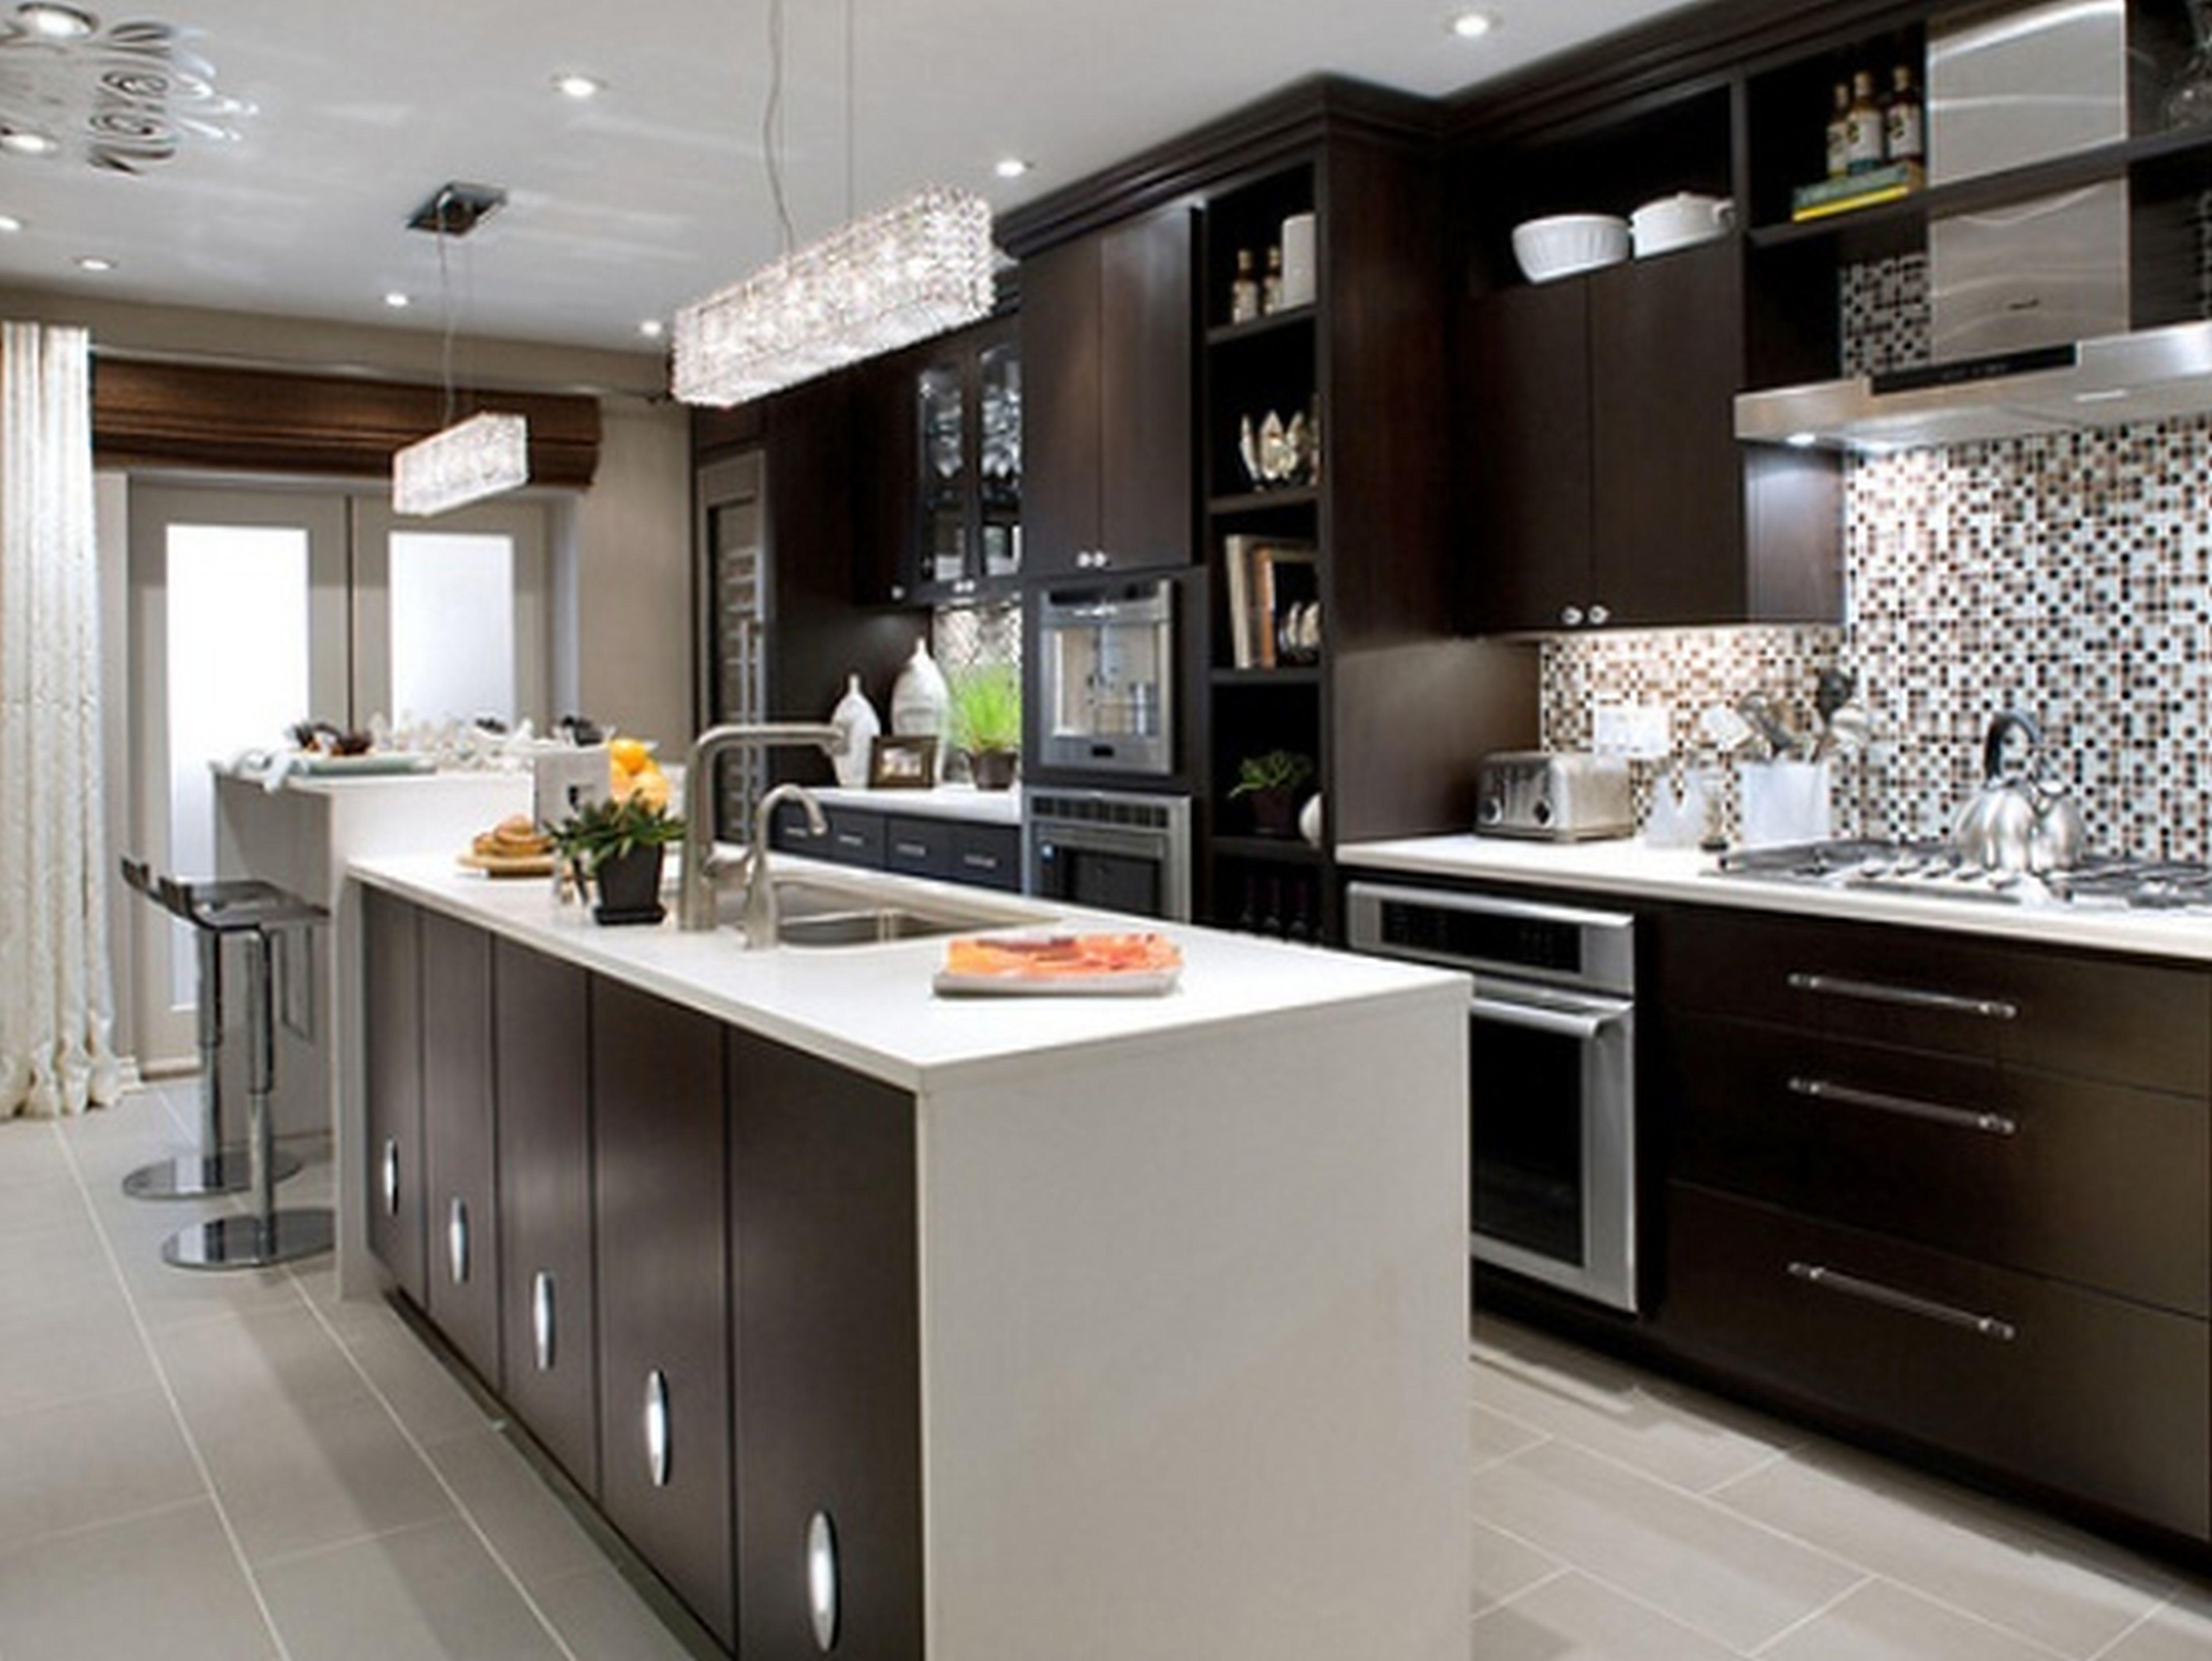 cocinas panosundaki pin on kitchen decor themes modern id=66594